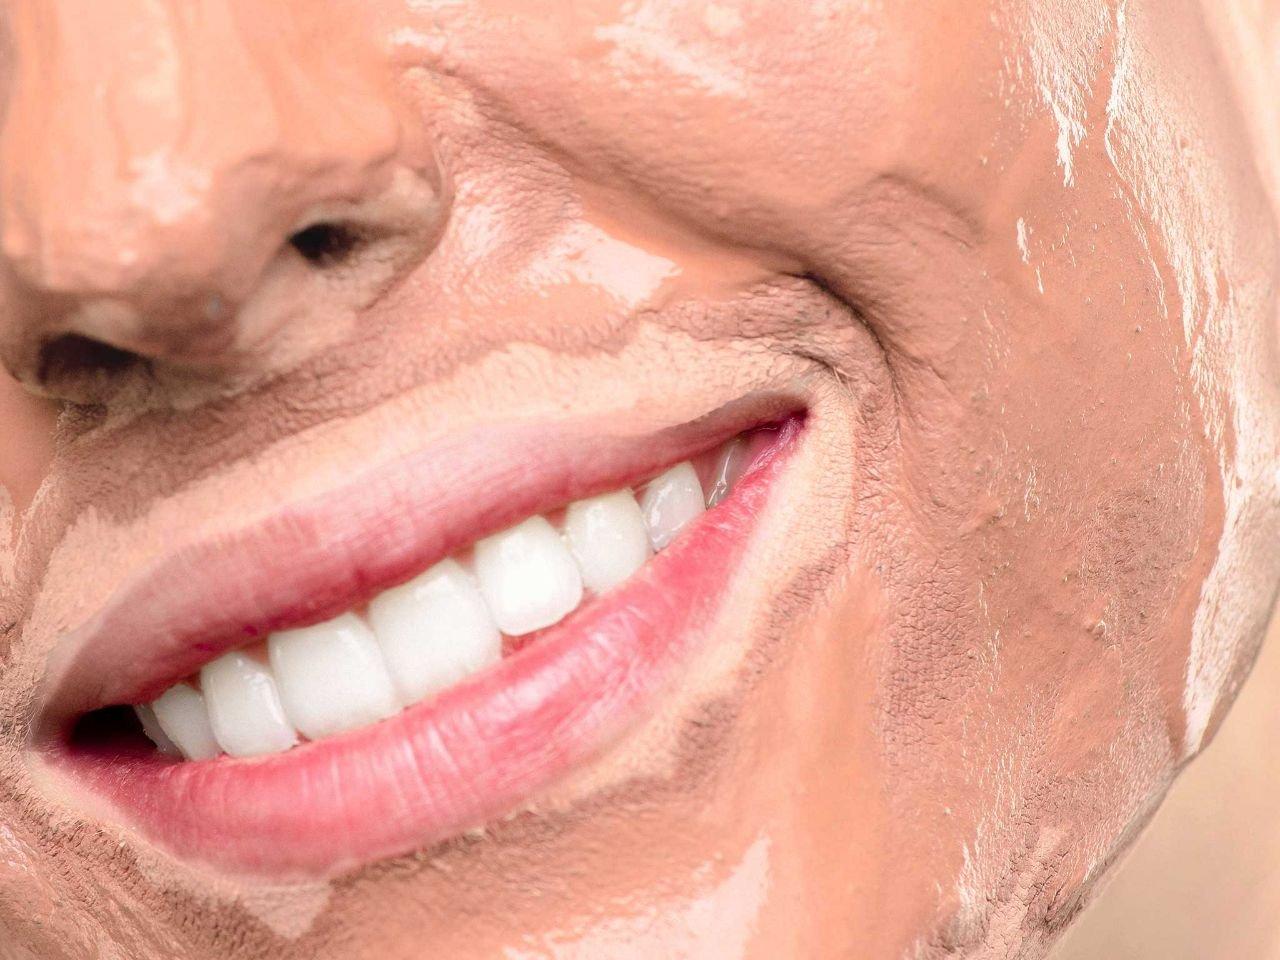 Maschera Viso Fai da Te Antiossidante + Gel Aloe Idratante - v10